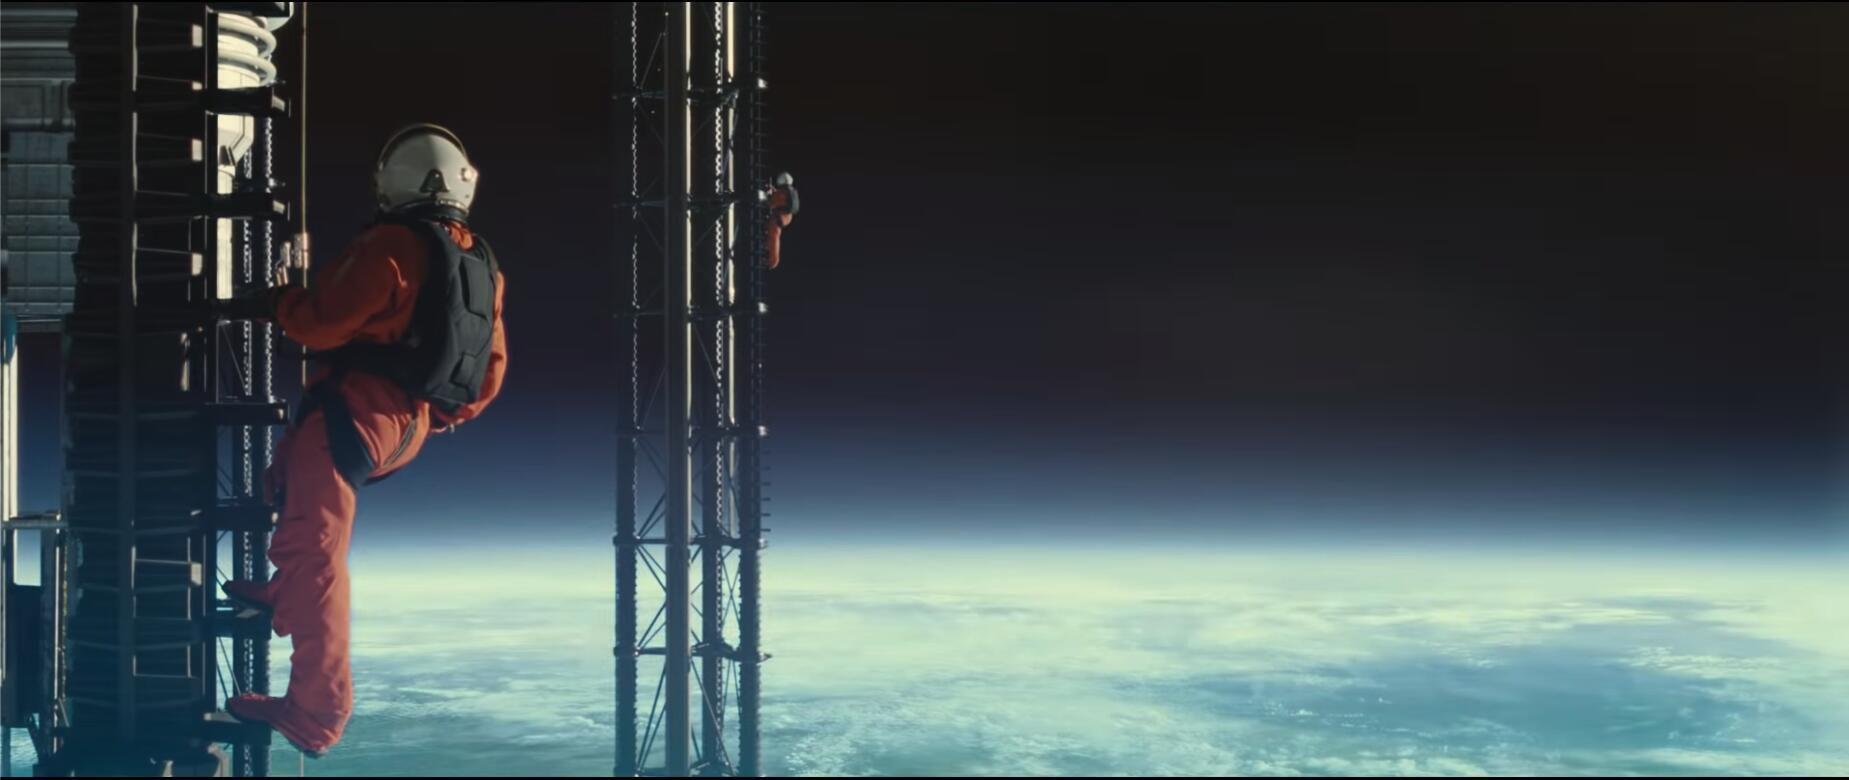 ad astra ascenseur spatial astronautes